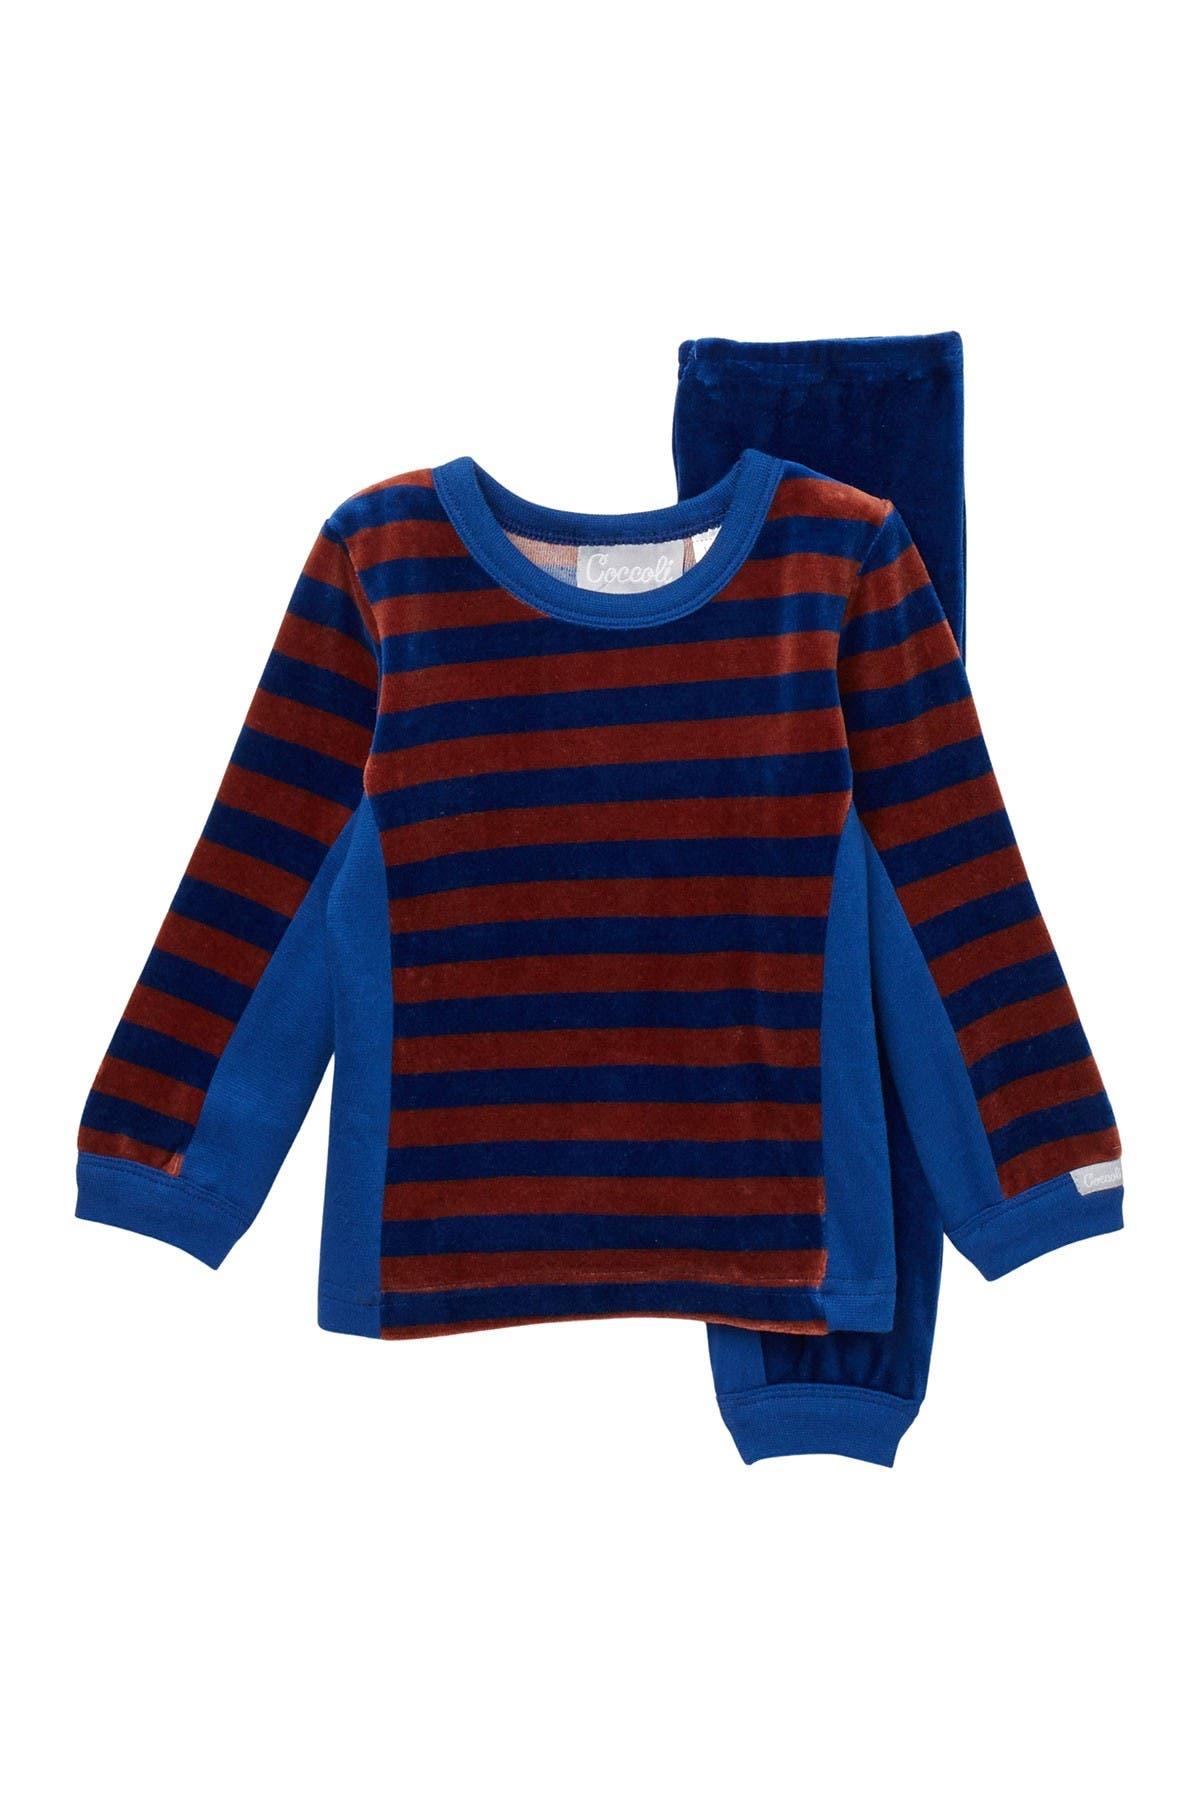 Image of Coccoli Striped Velour Long Sleeve Top & Pants Pajama Set